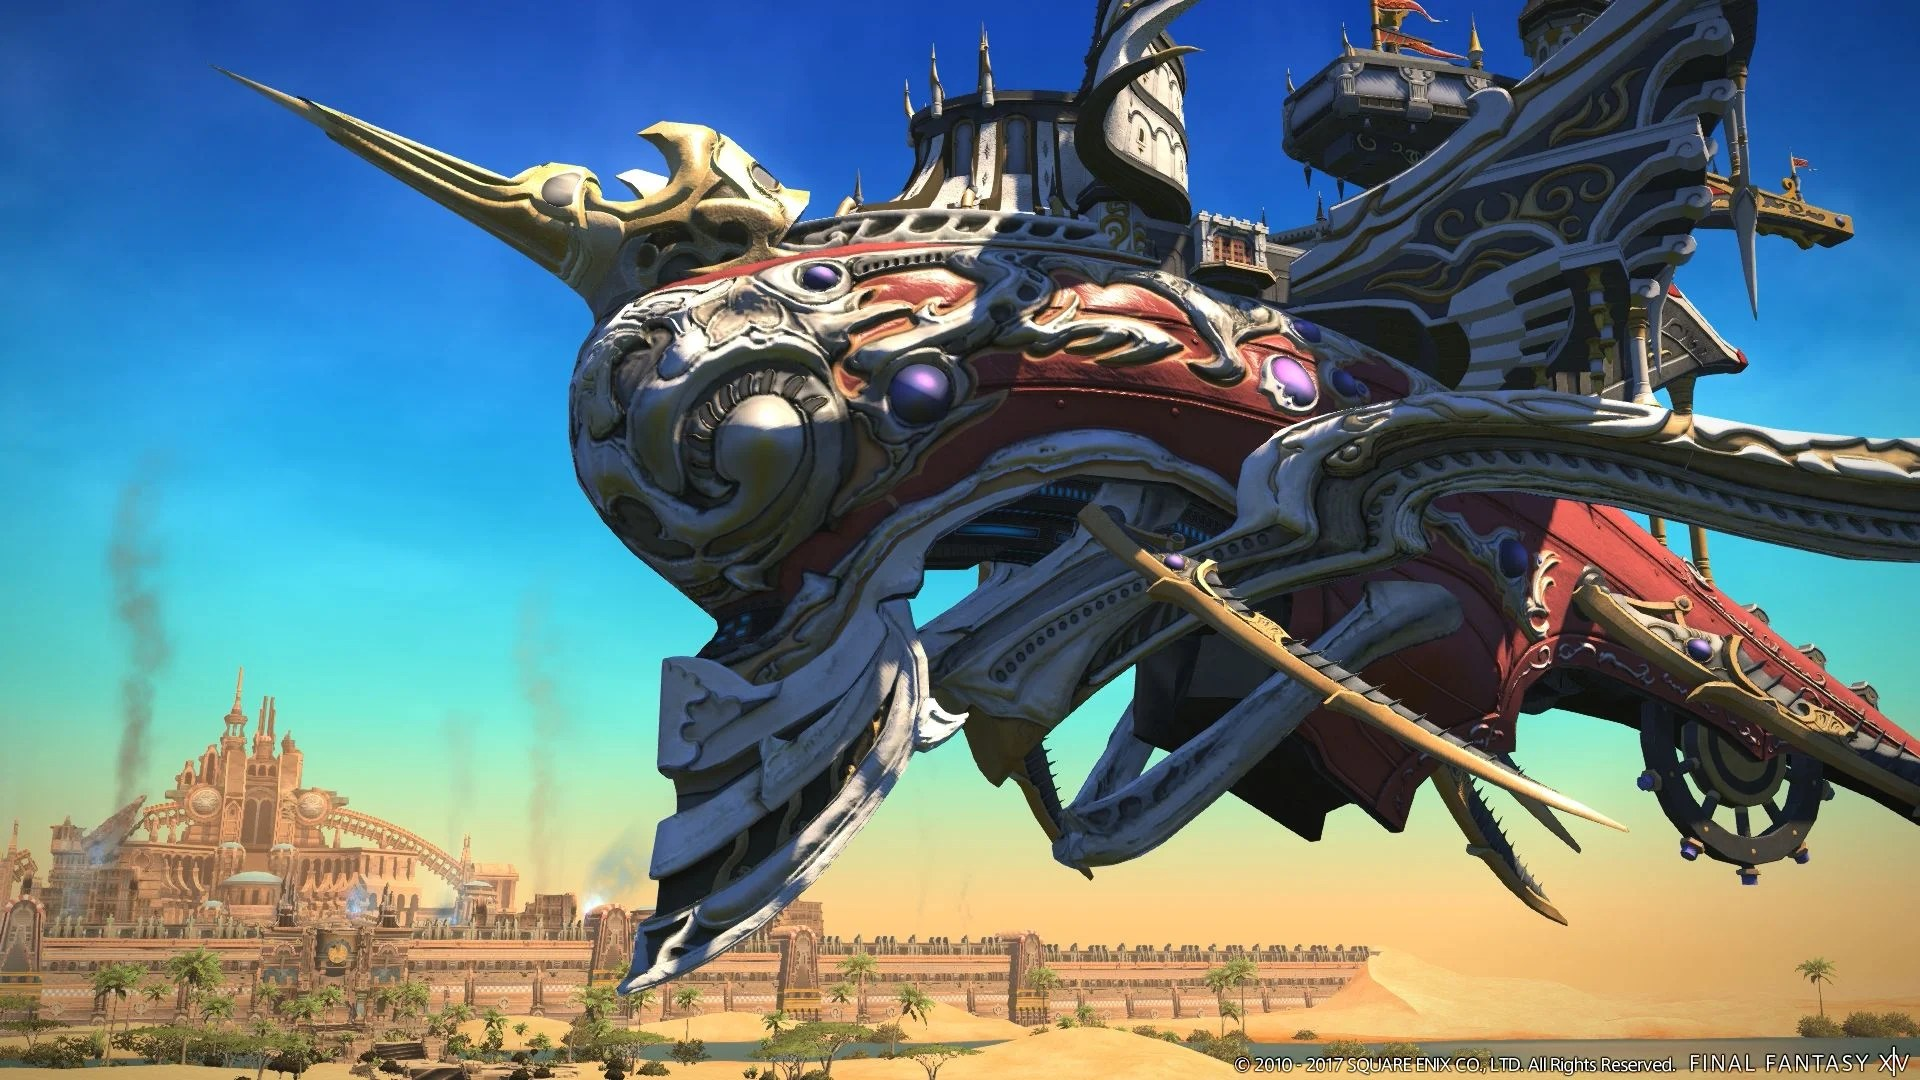 New Screenshots Of Final Fantasy XIV The Legend Returns